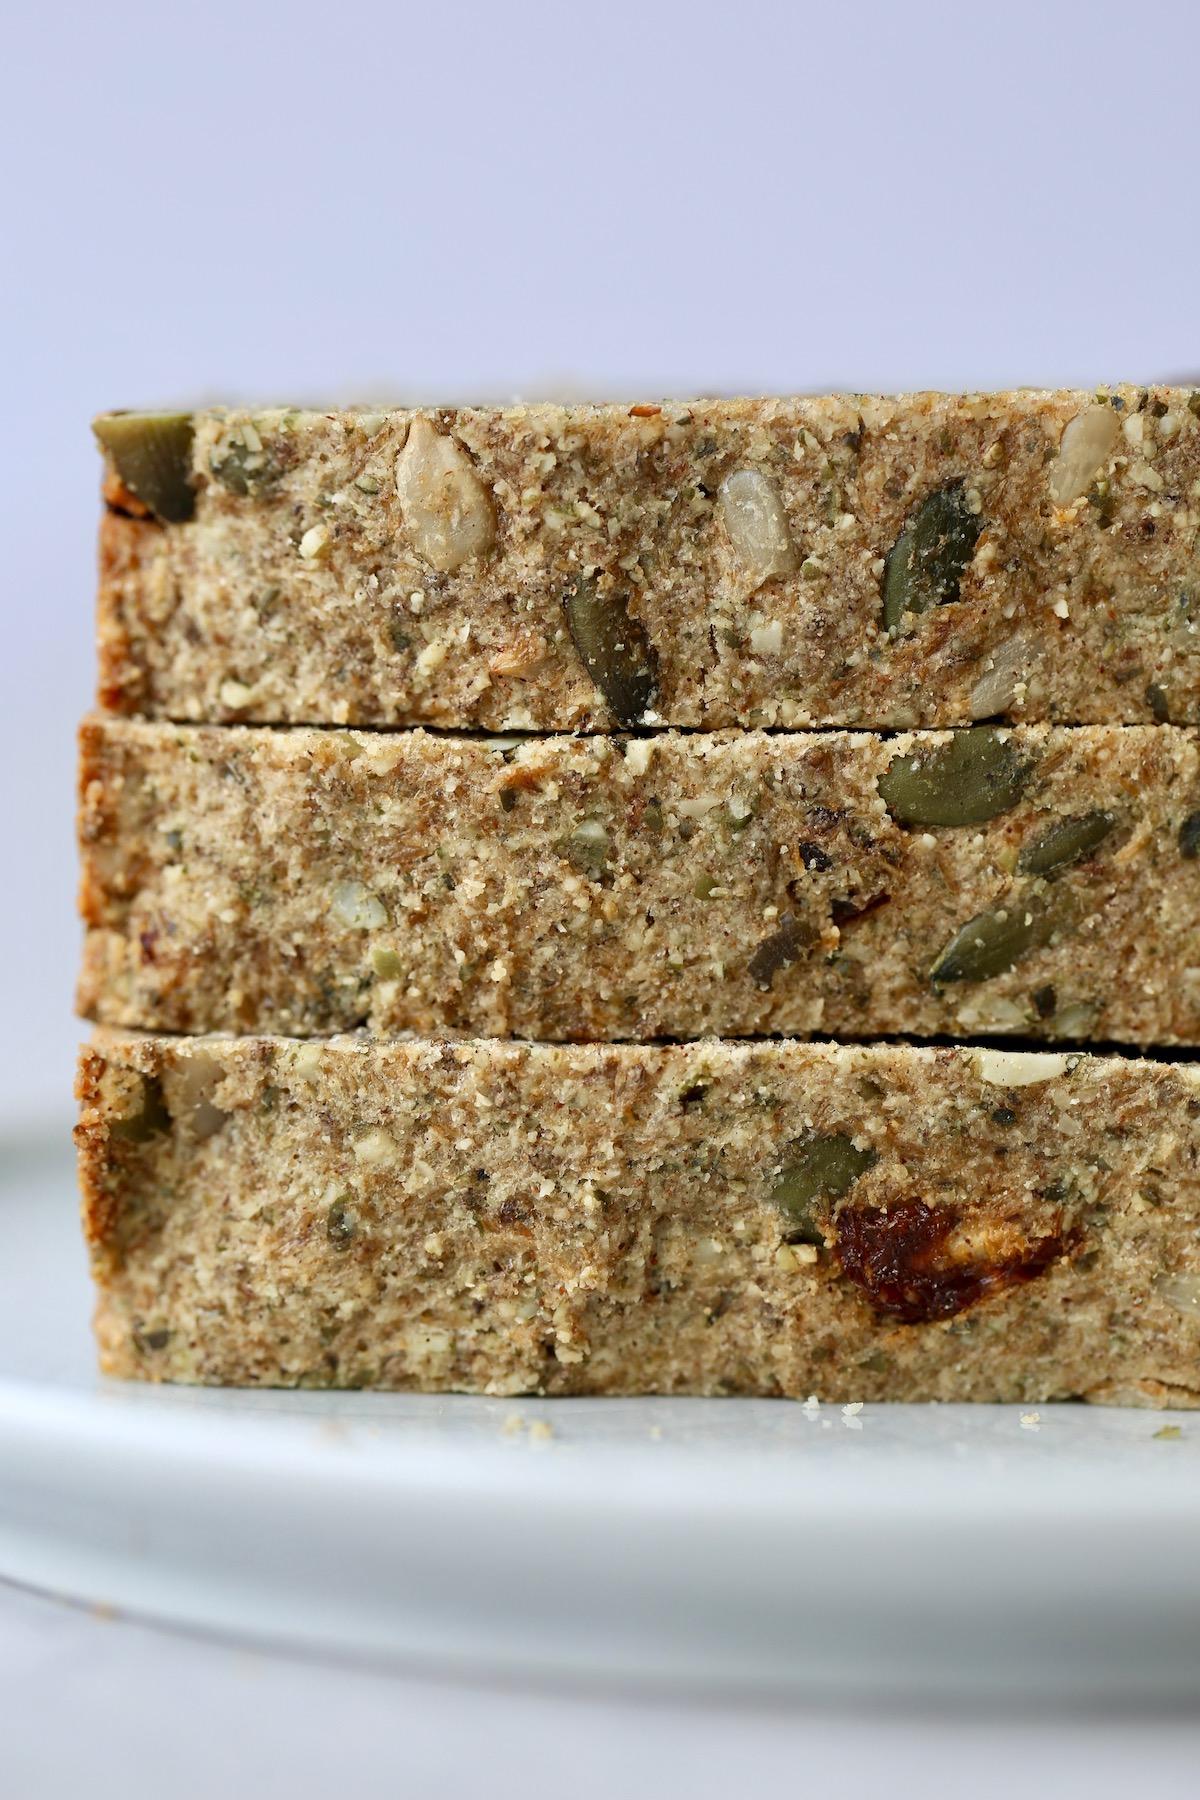 three slices of gluten free cinnamon raisin seed bread stacked on each other